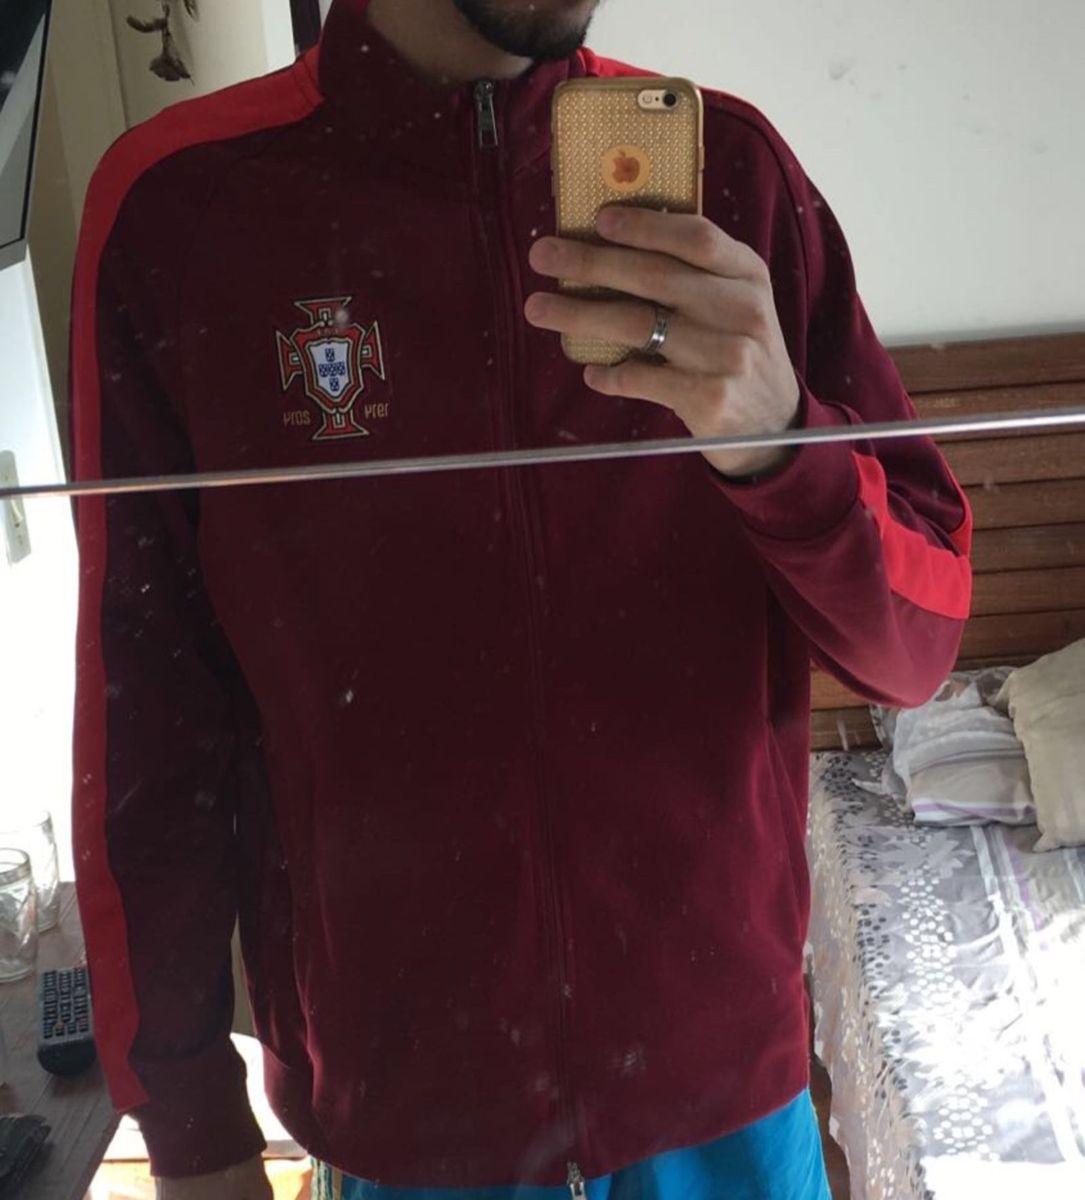 blusa - jaqueta de portugal - copa de 2014 - casacos authentic bbf583be62de6